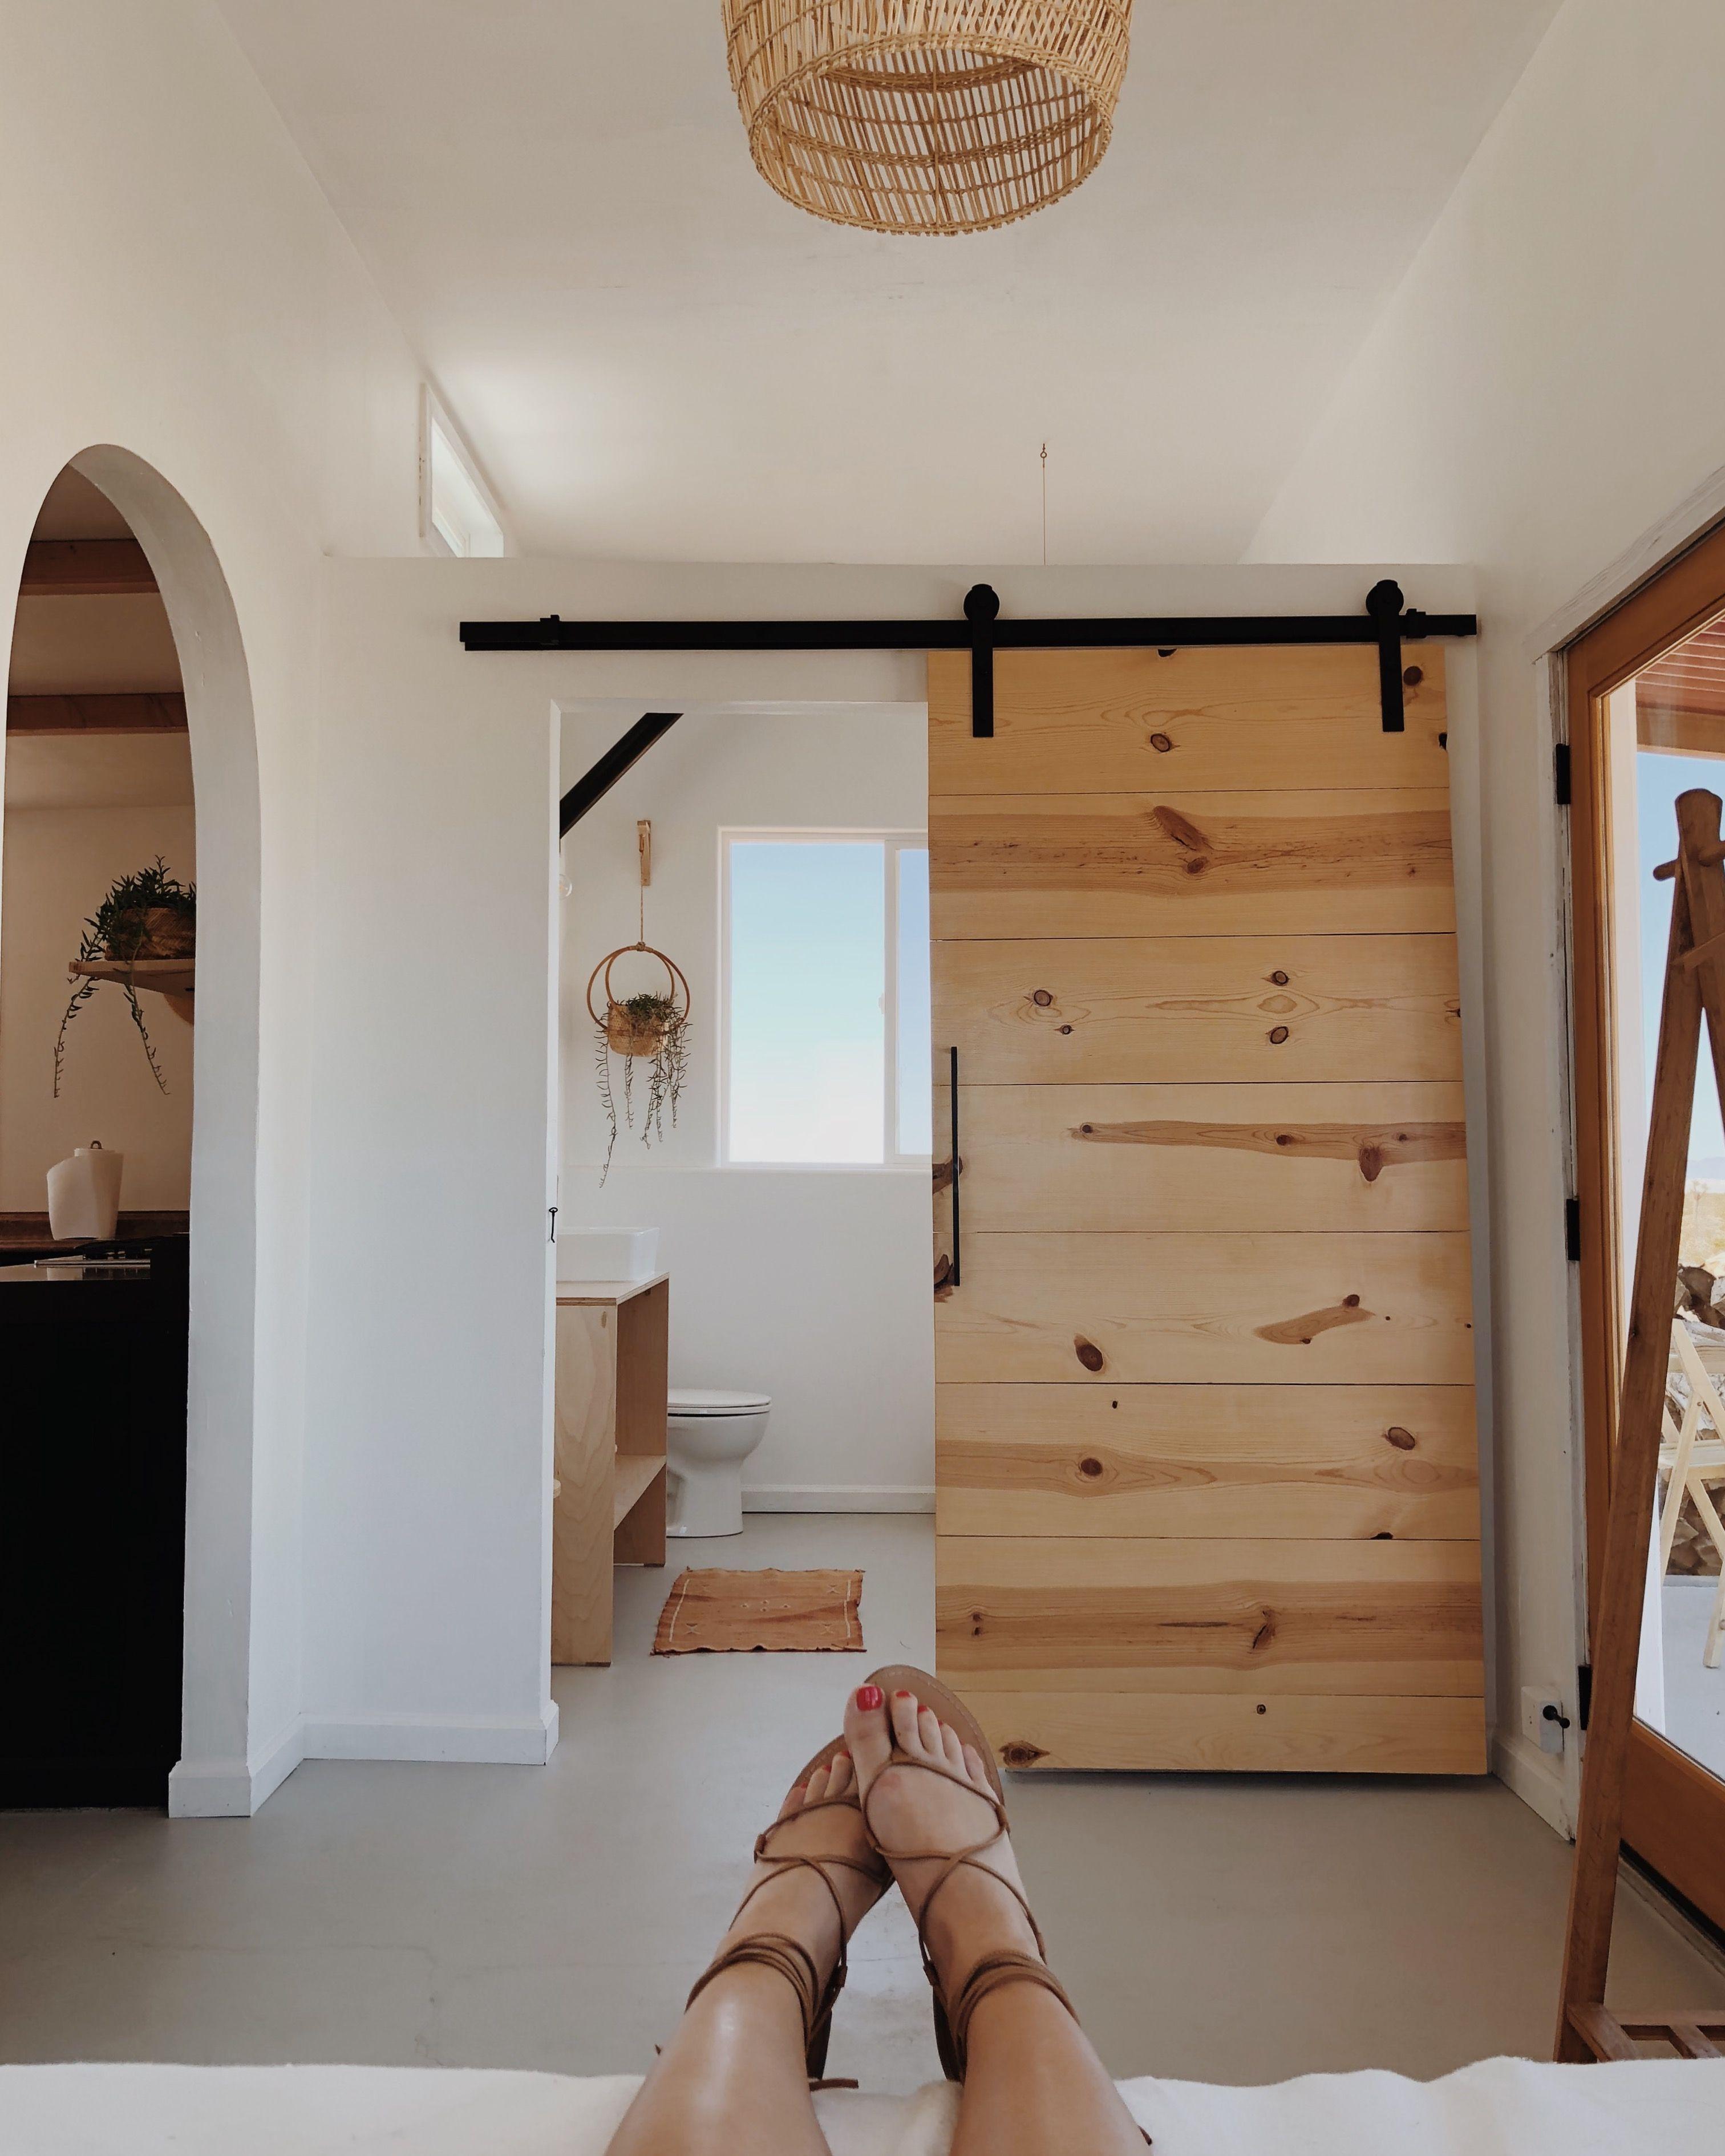 Cheap Unique Home Decor: Pin By Chelsea Ruitenberg On Interiors